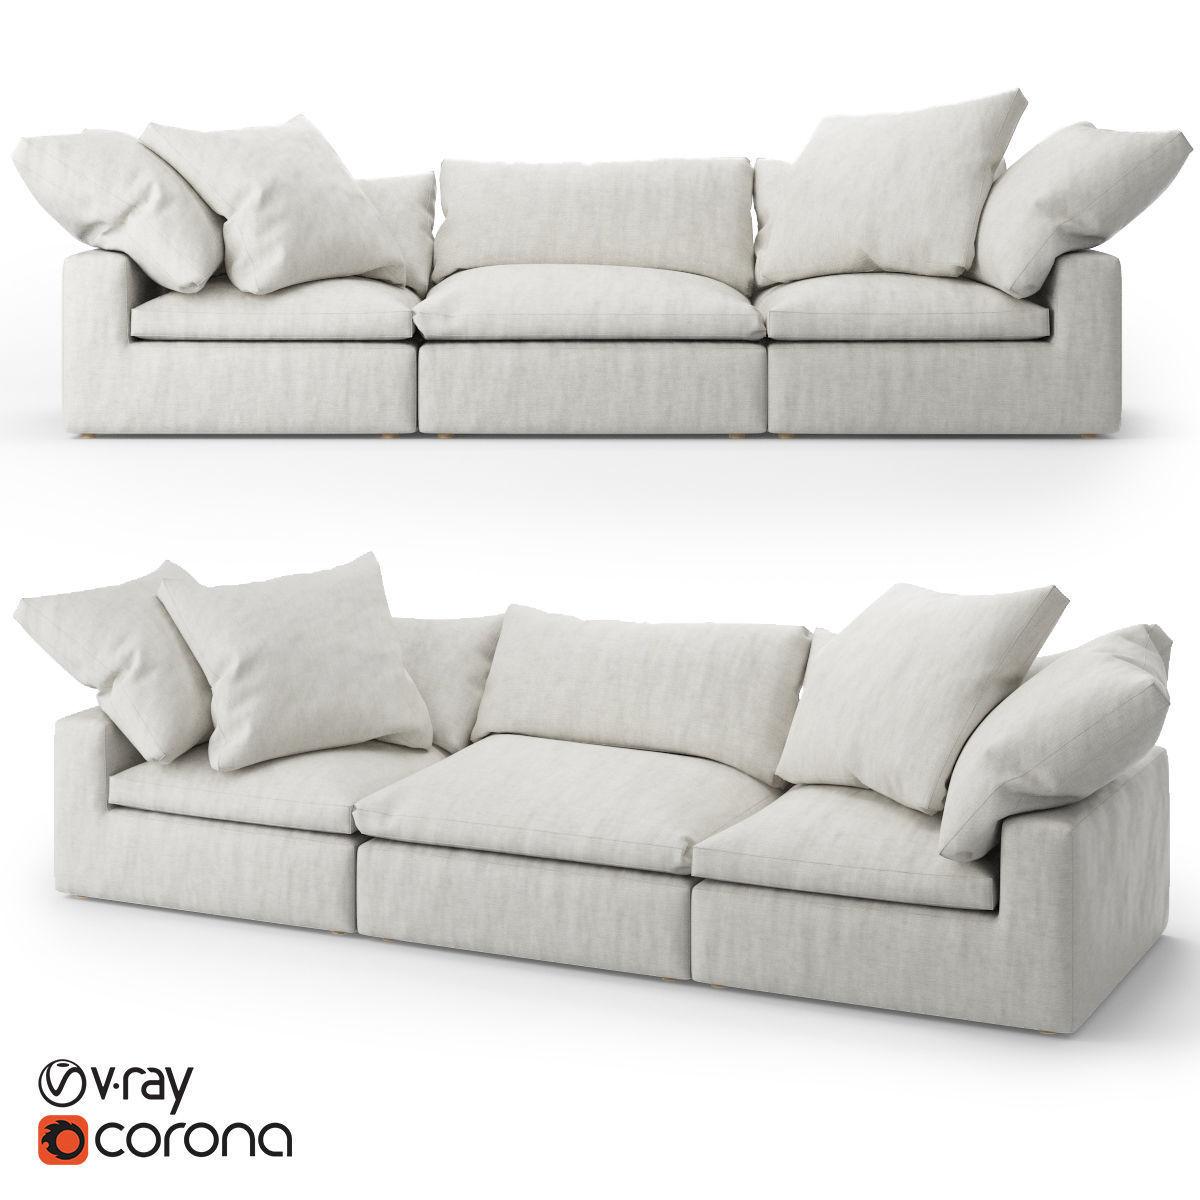 Restoration Hardware Cloud Modular Fabric Sofa